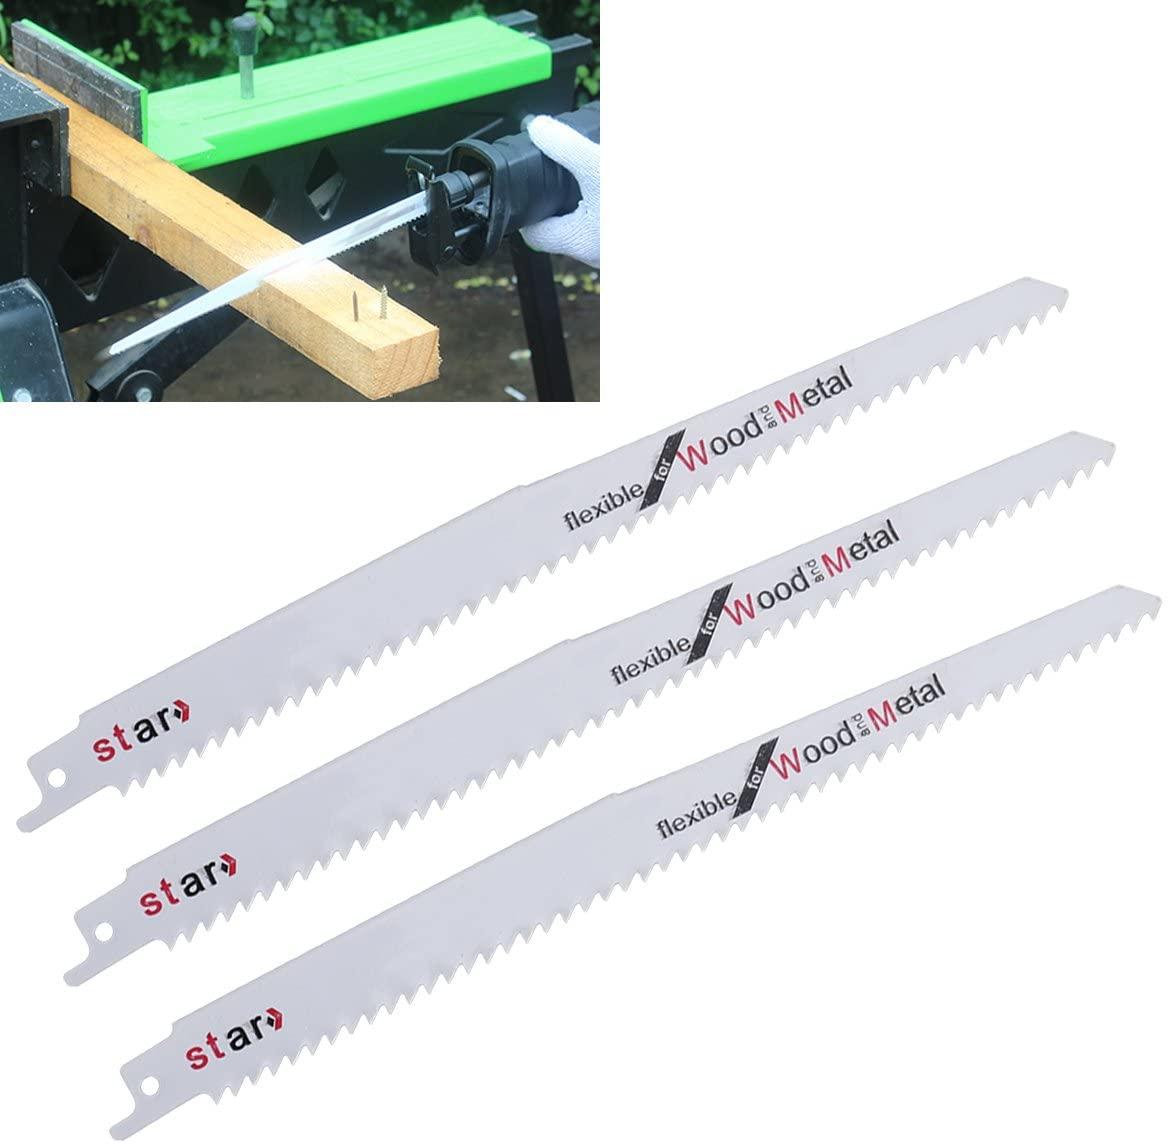 BESTOMZ 3Pcs Reciprocating Saw Blade for Density / Plastic Boards